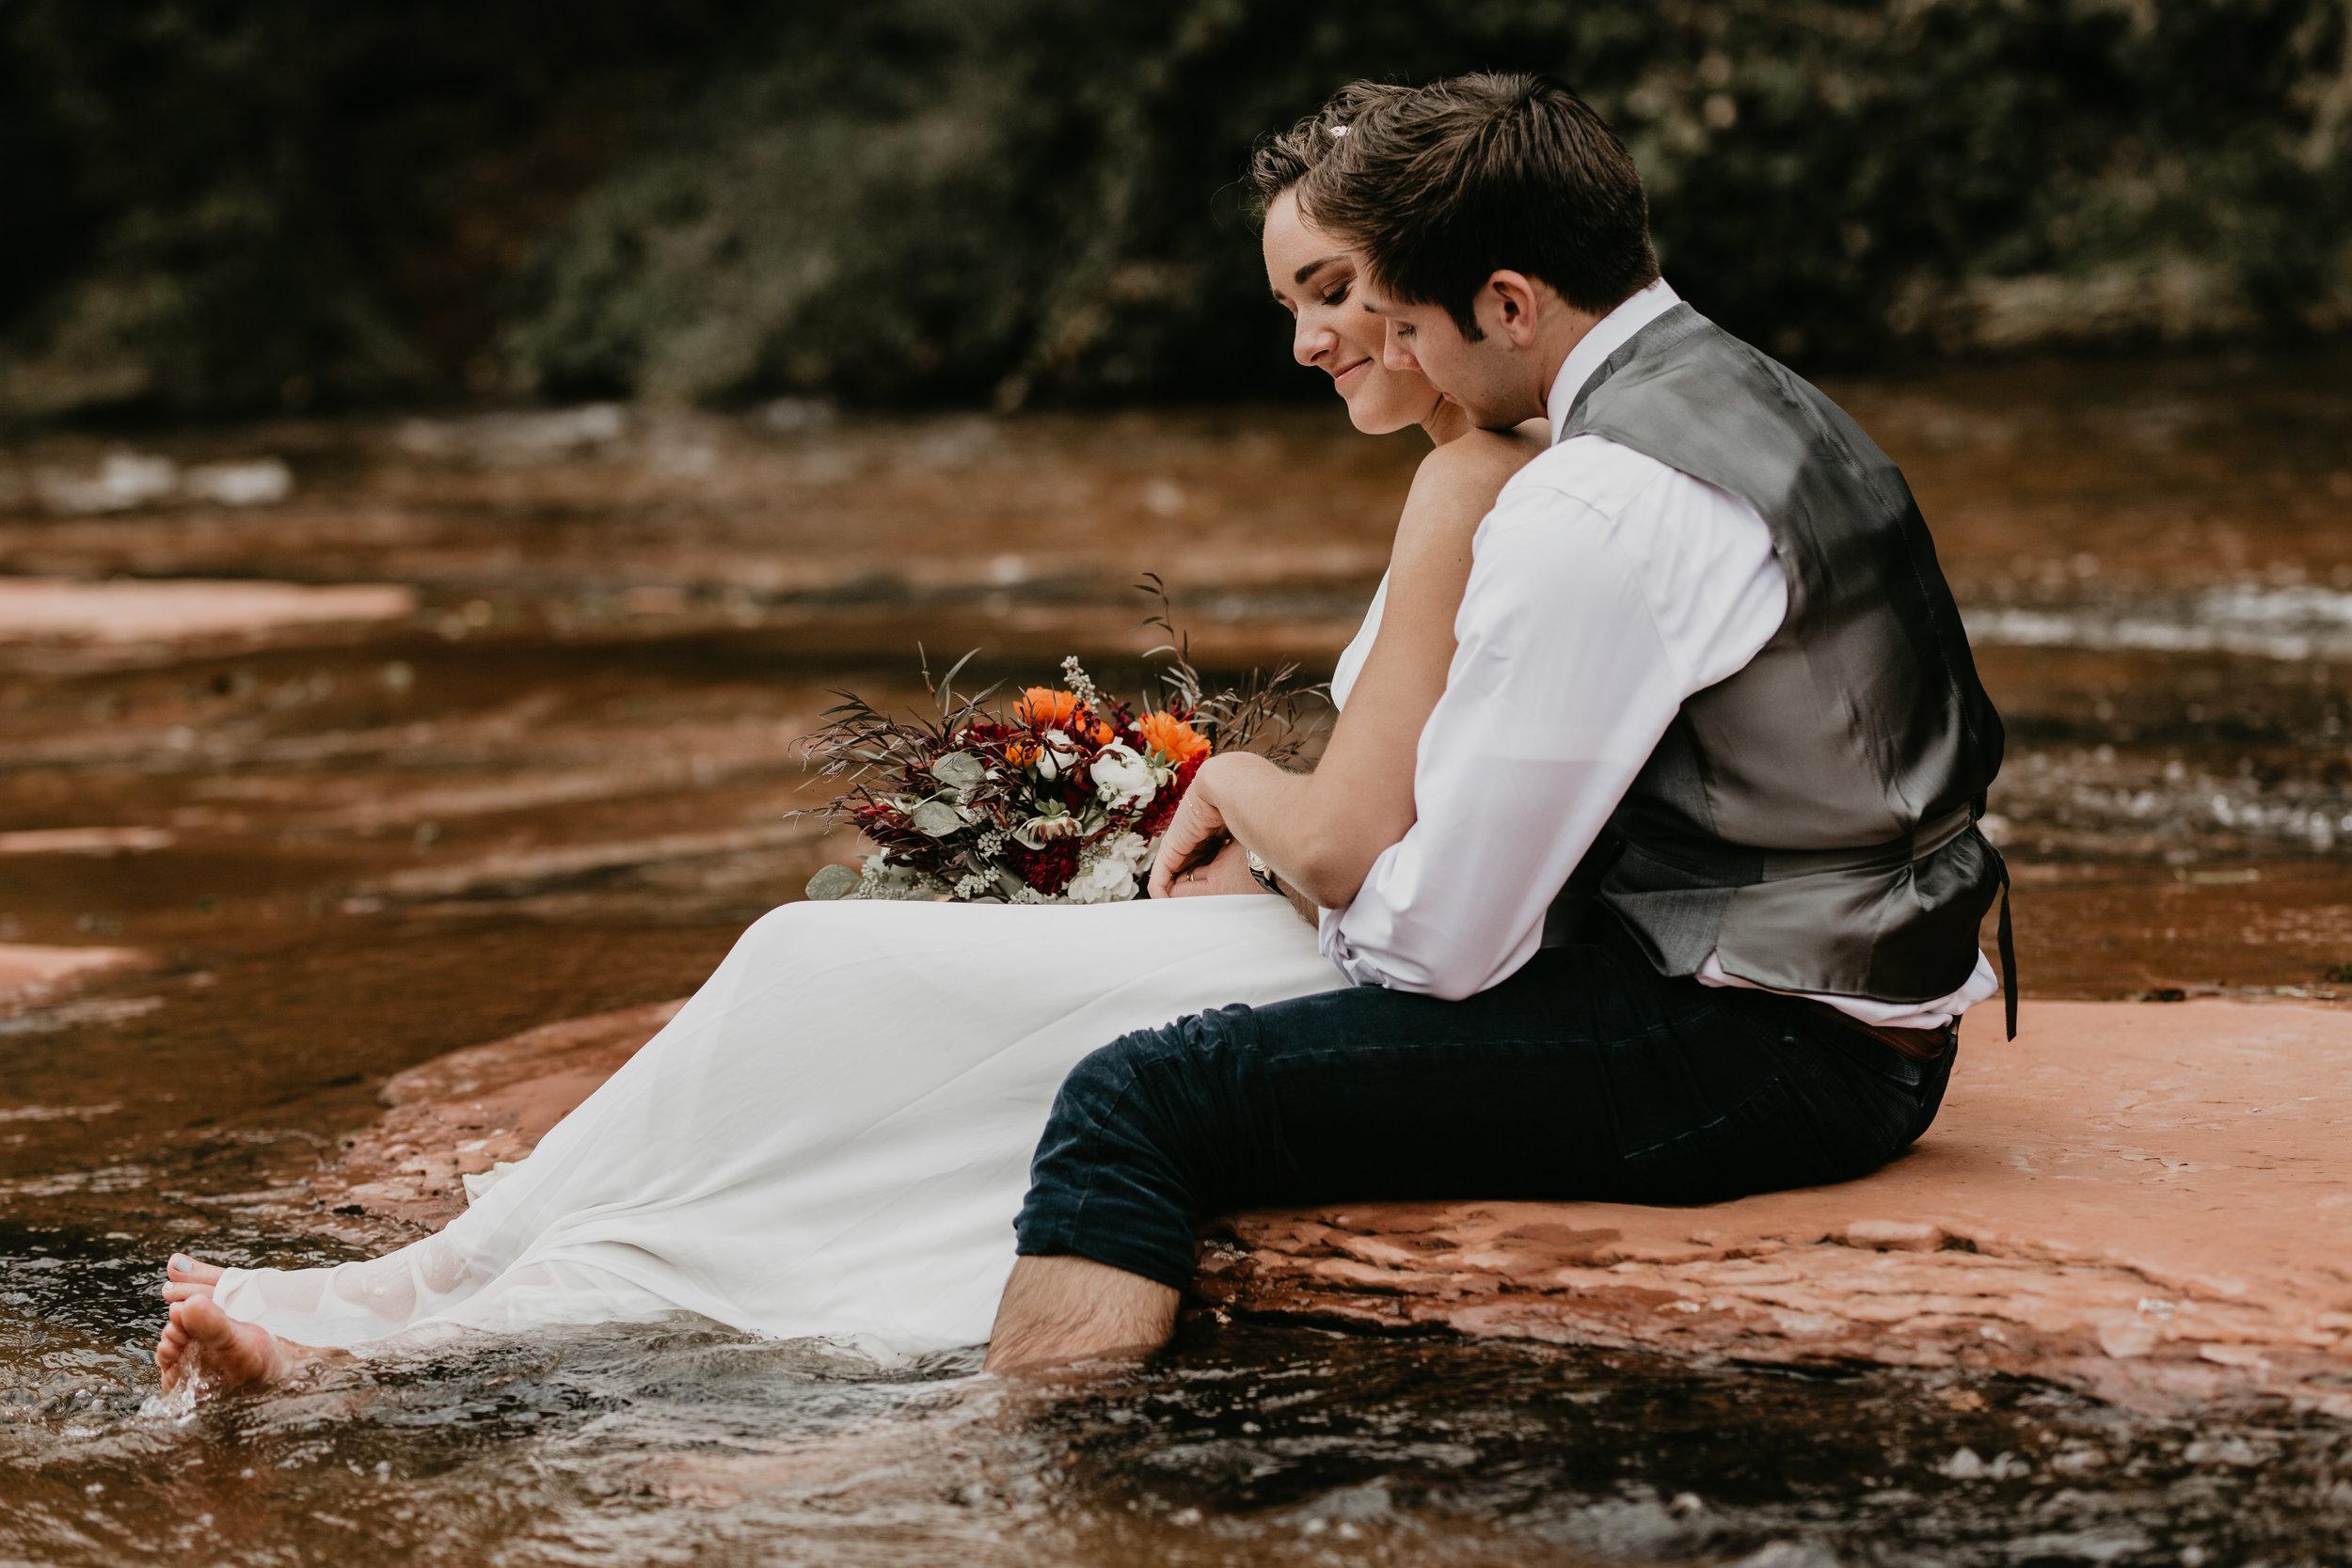 nicole-daacke-photography-sedona-arizona-destination-elopement-wedding-photographer-catherdral-rock-hiking-elopement-sedona-river-elopement-photos-desert-rock-wedding-photographer-laid-back-spontaneous-elopement-112.jpg